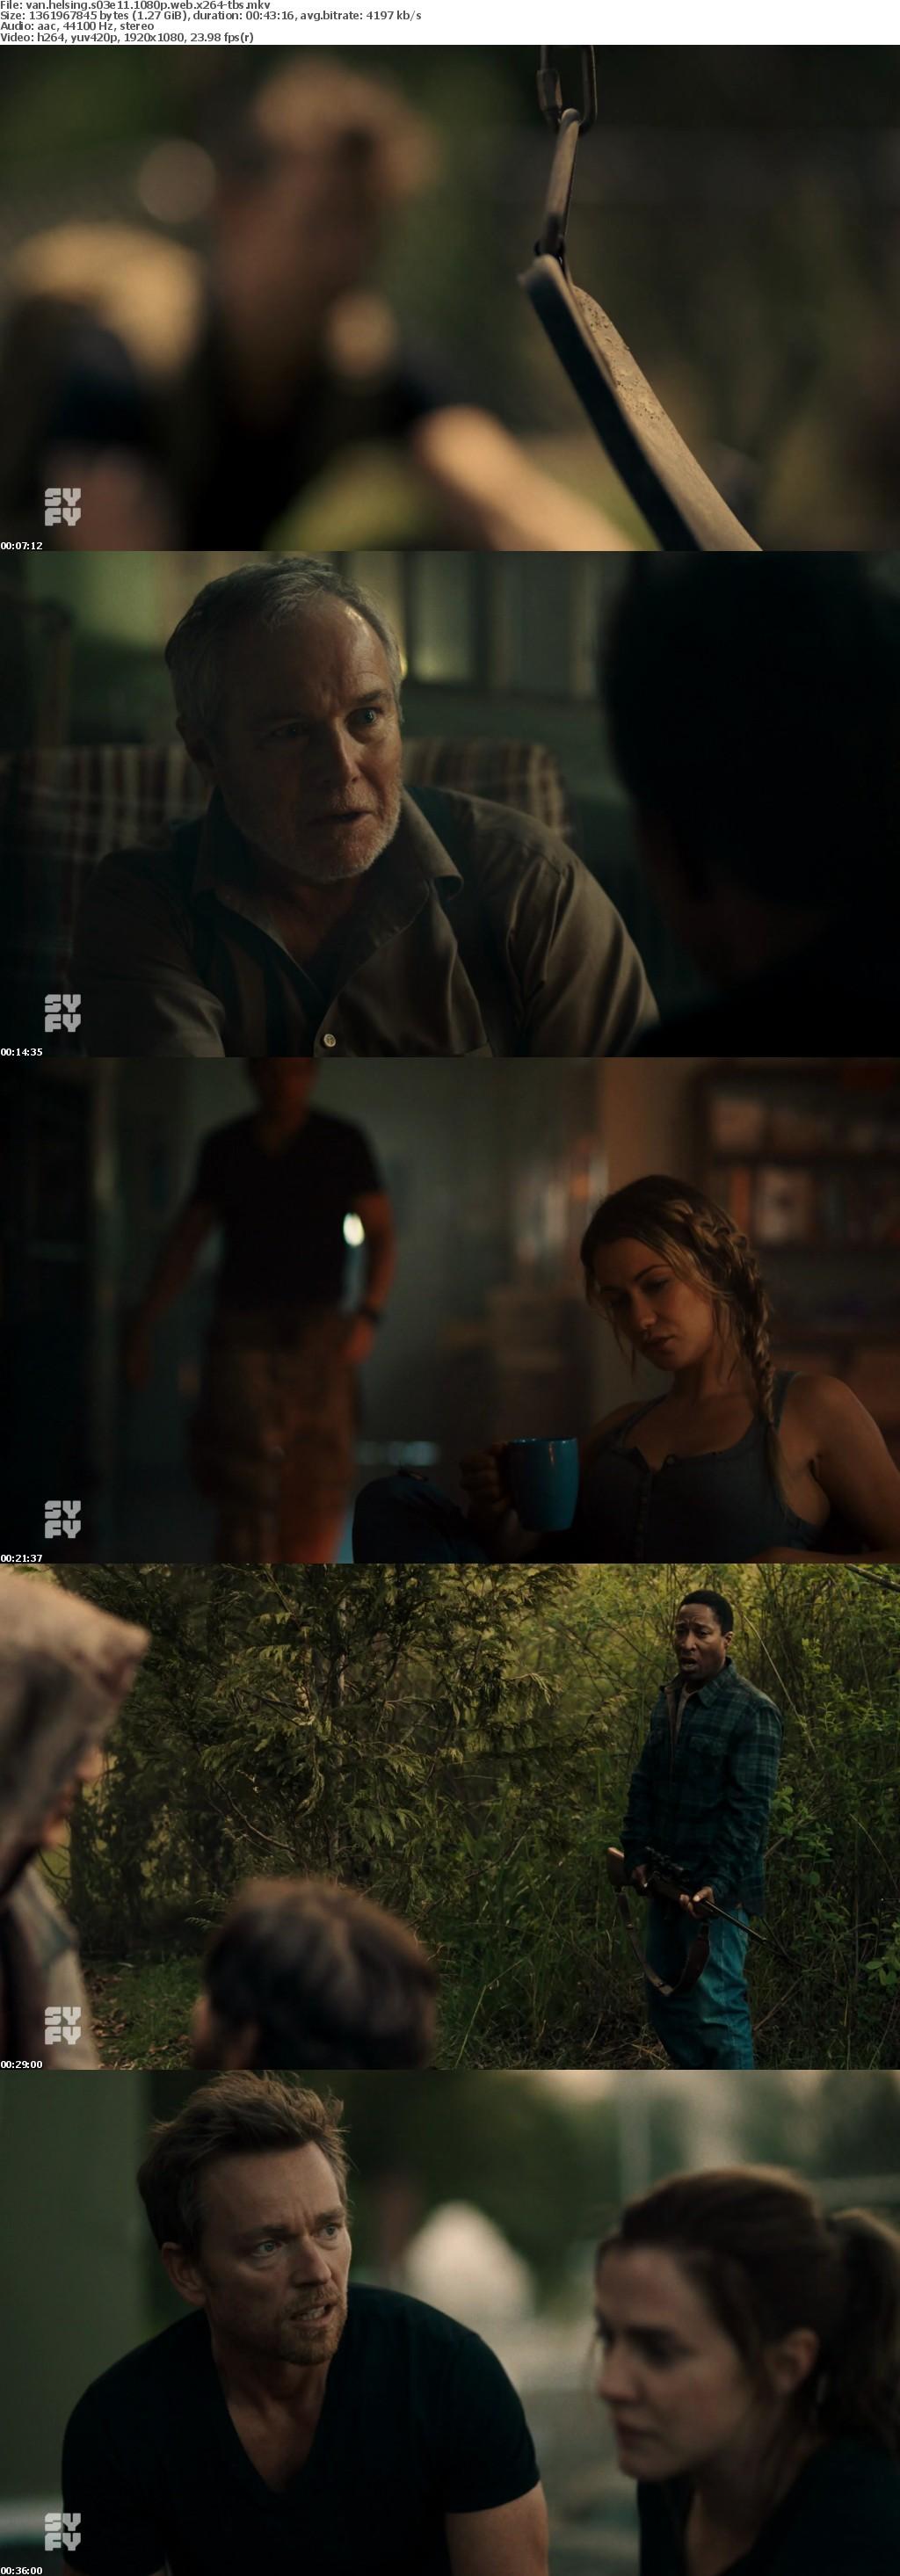 Van Helsing S03E11 1080p WEB x264-TBS